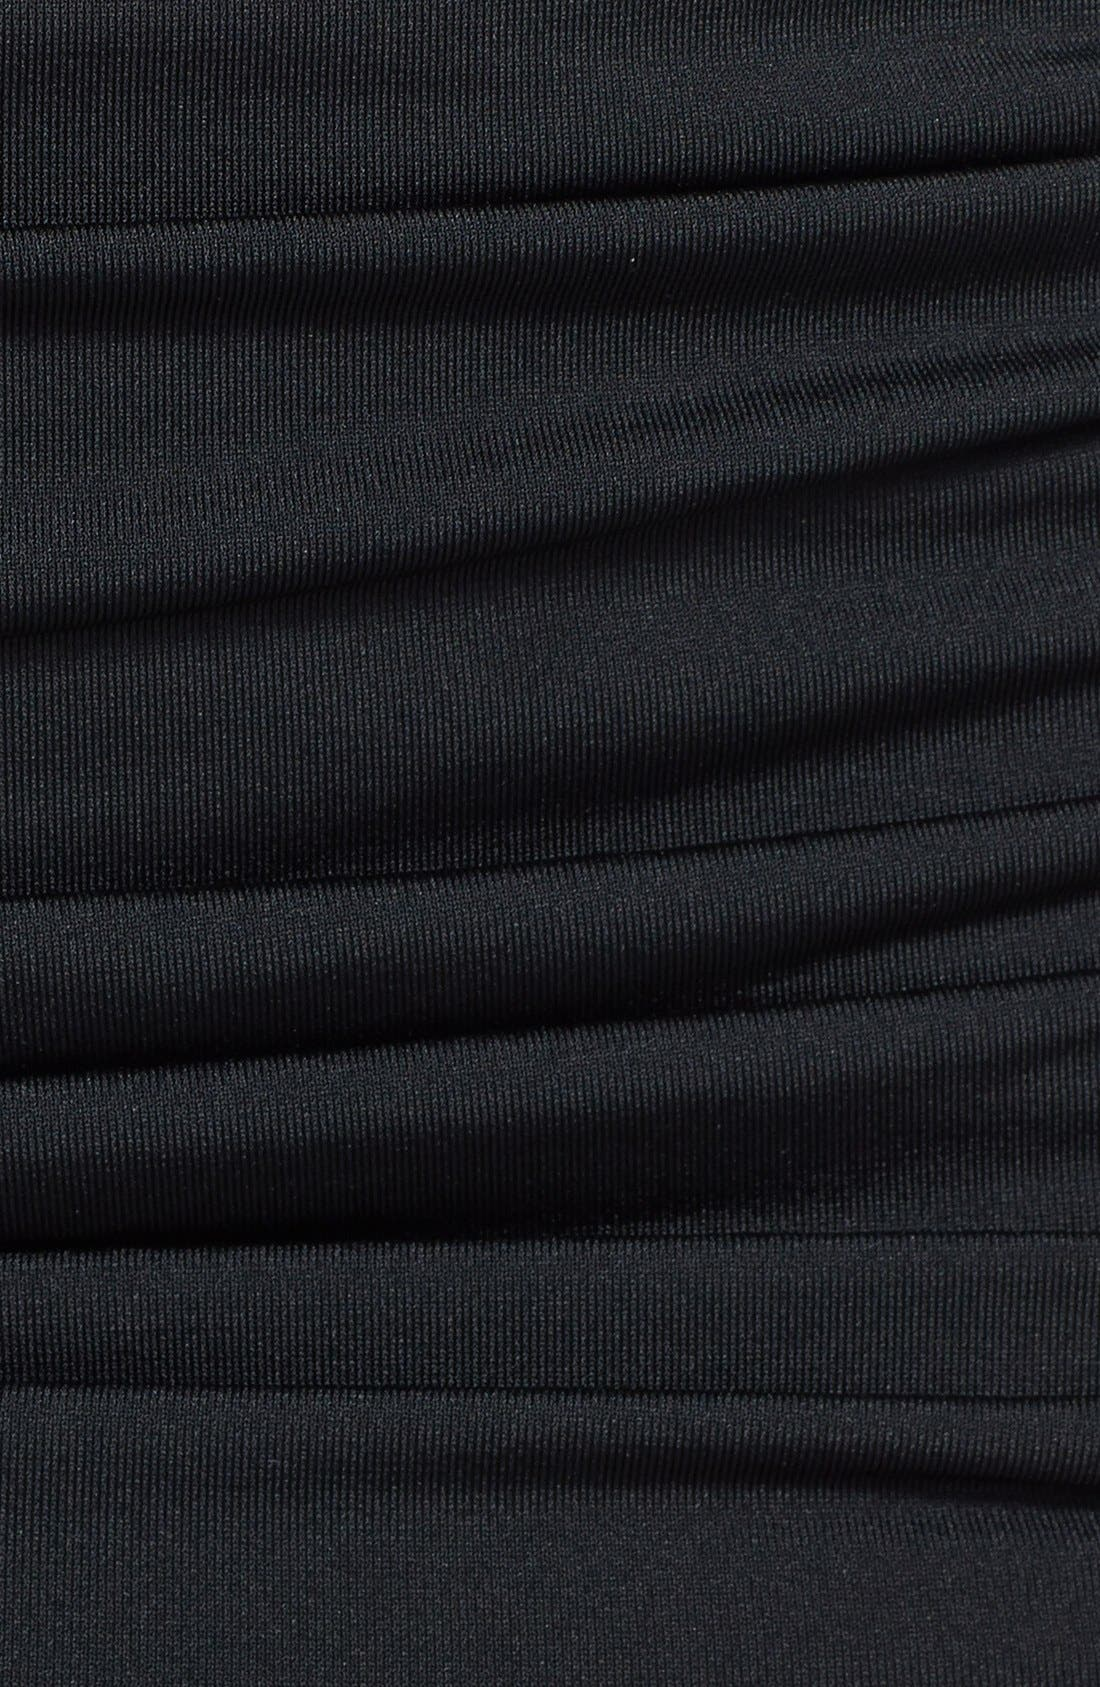 Carmen Marc Valvo 'Cape Town Beach' Shirred Skirted Bikini Bottoms,                             Alternate thumbnail 3, color,